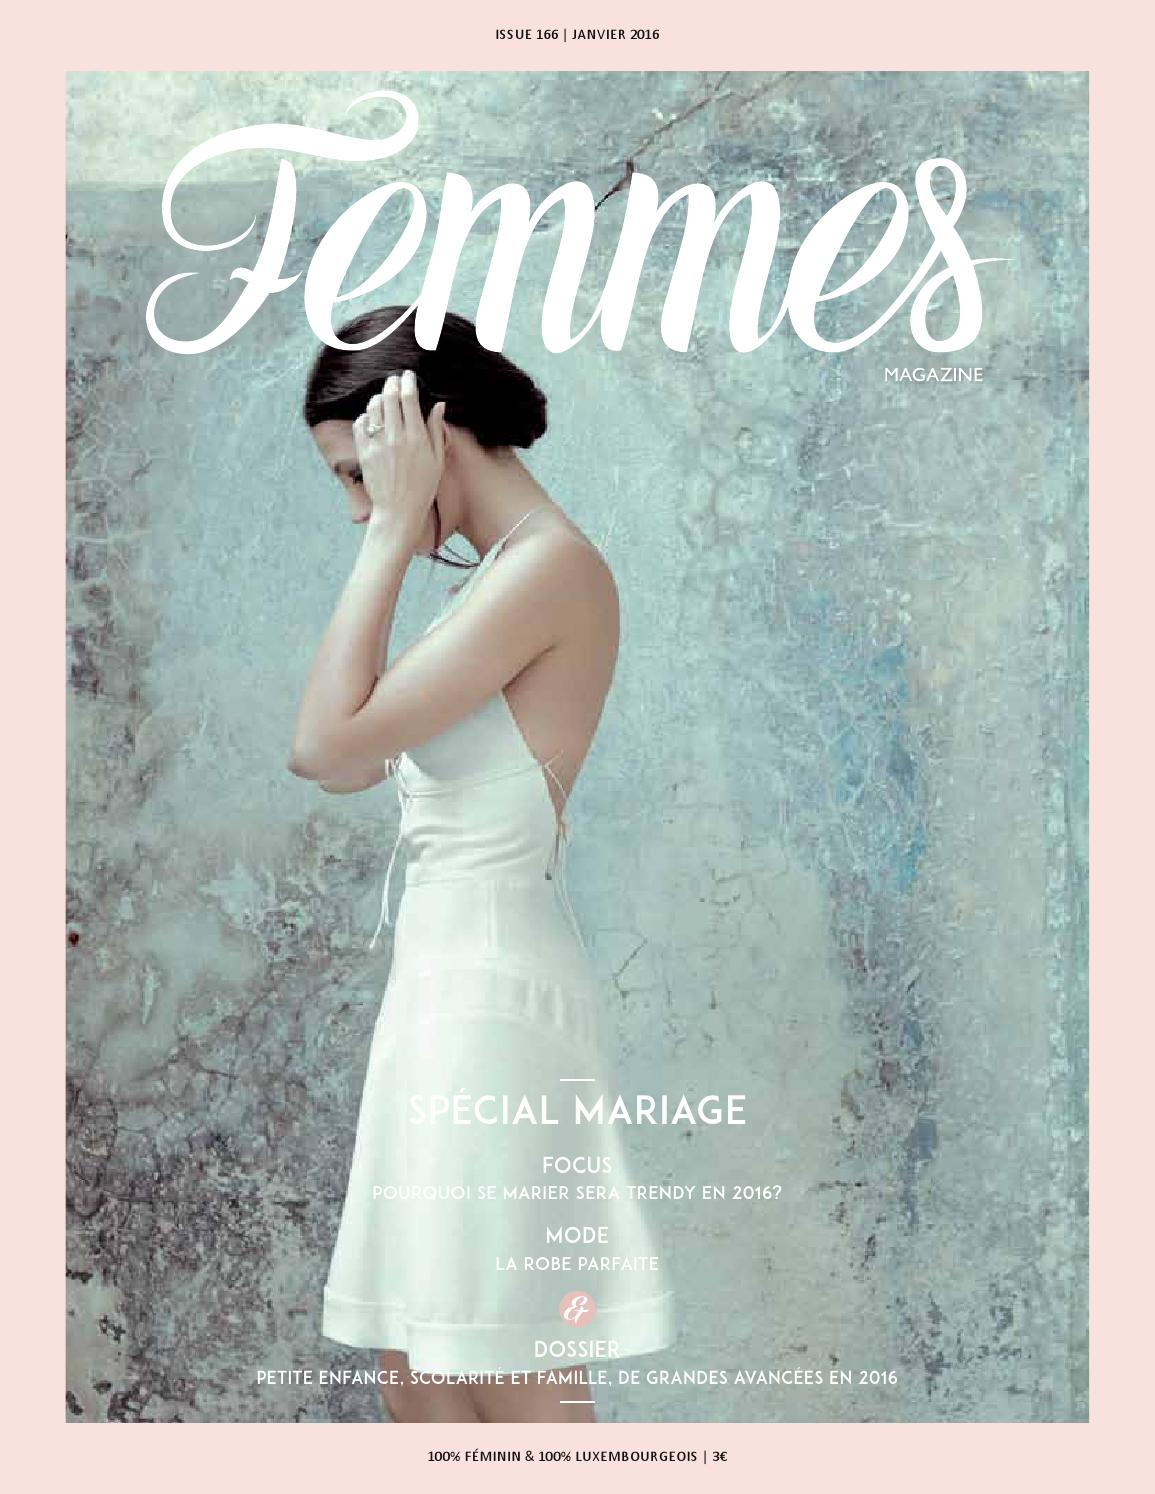 2dc87b7c6d Femmes Magazine Luxembourg Janvier 2016- 166 by alinea communication - issuu